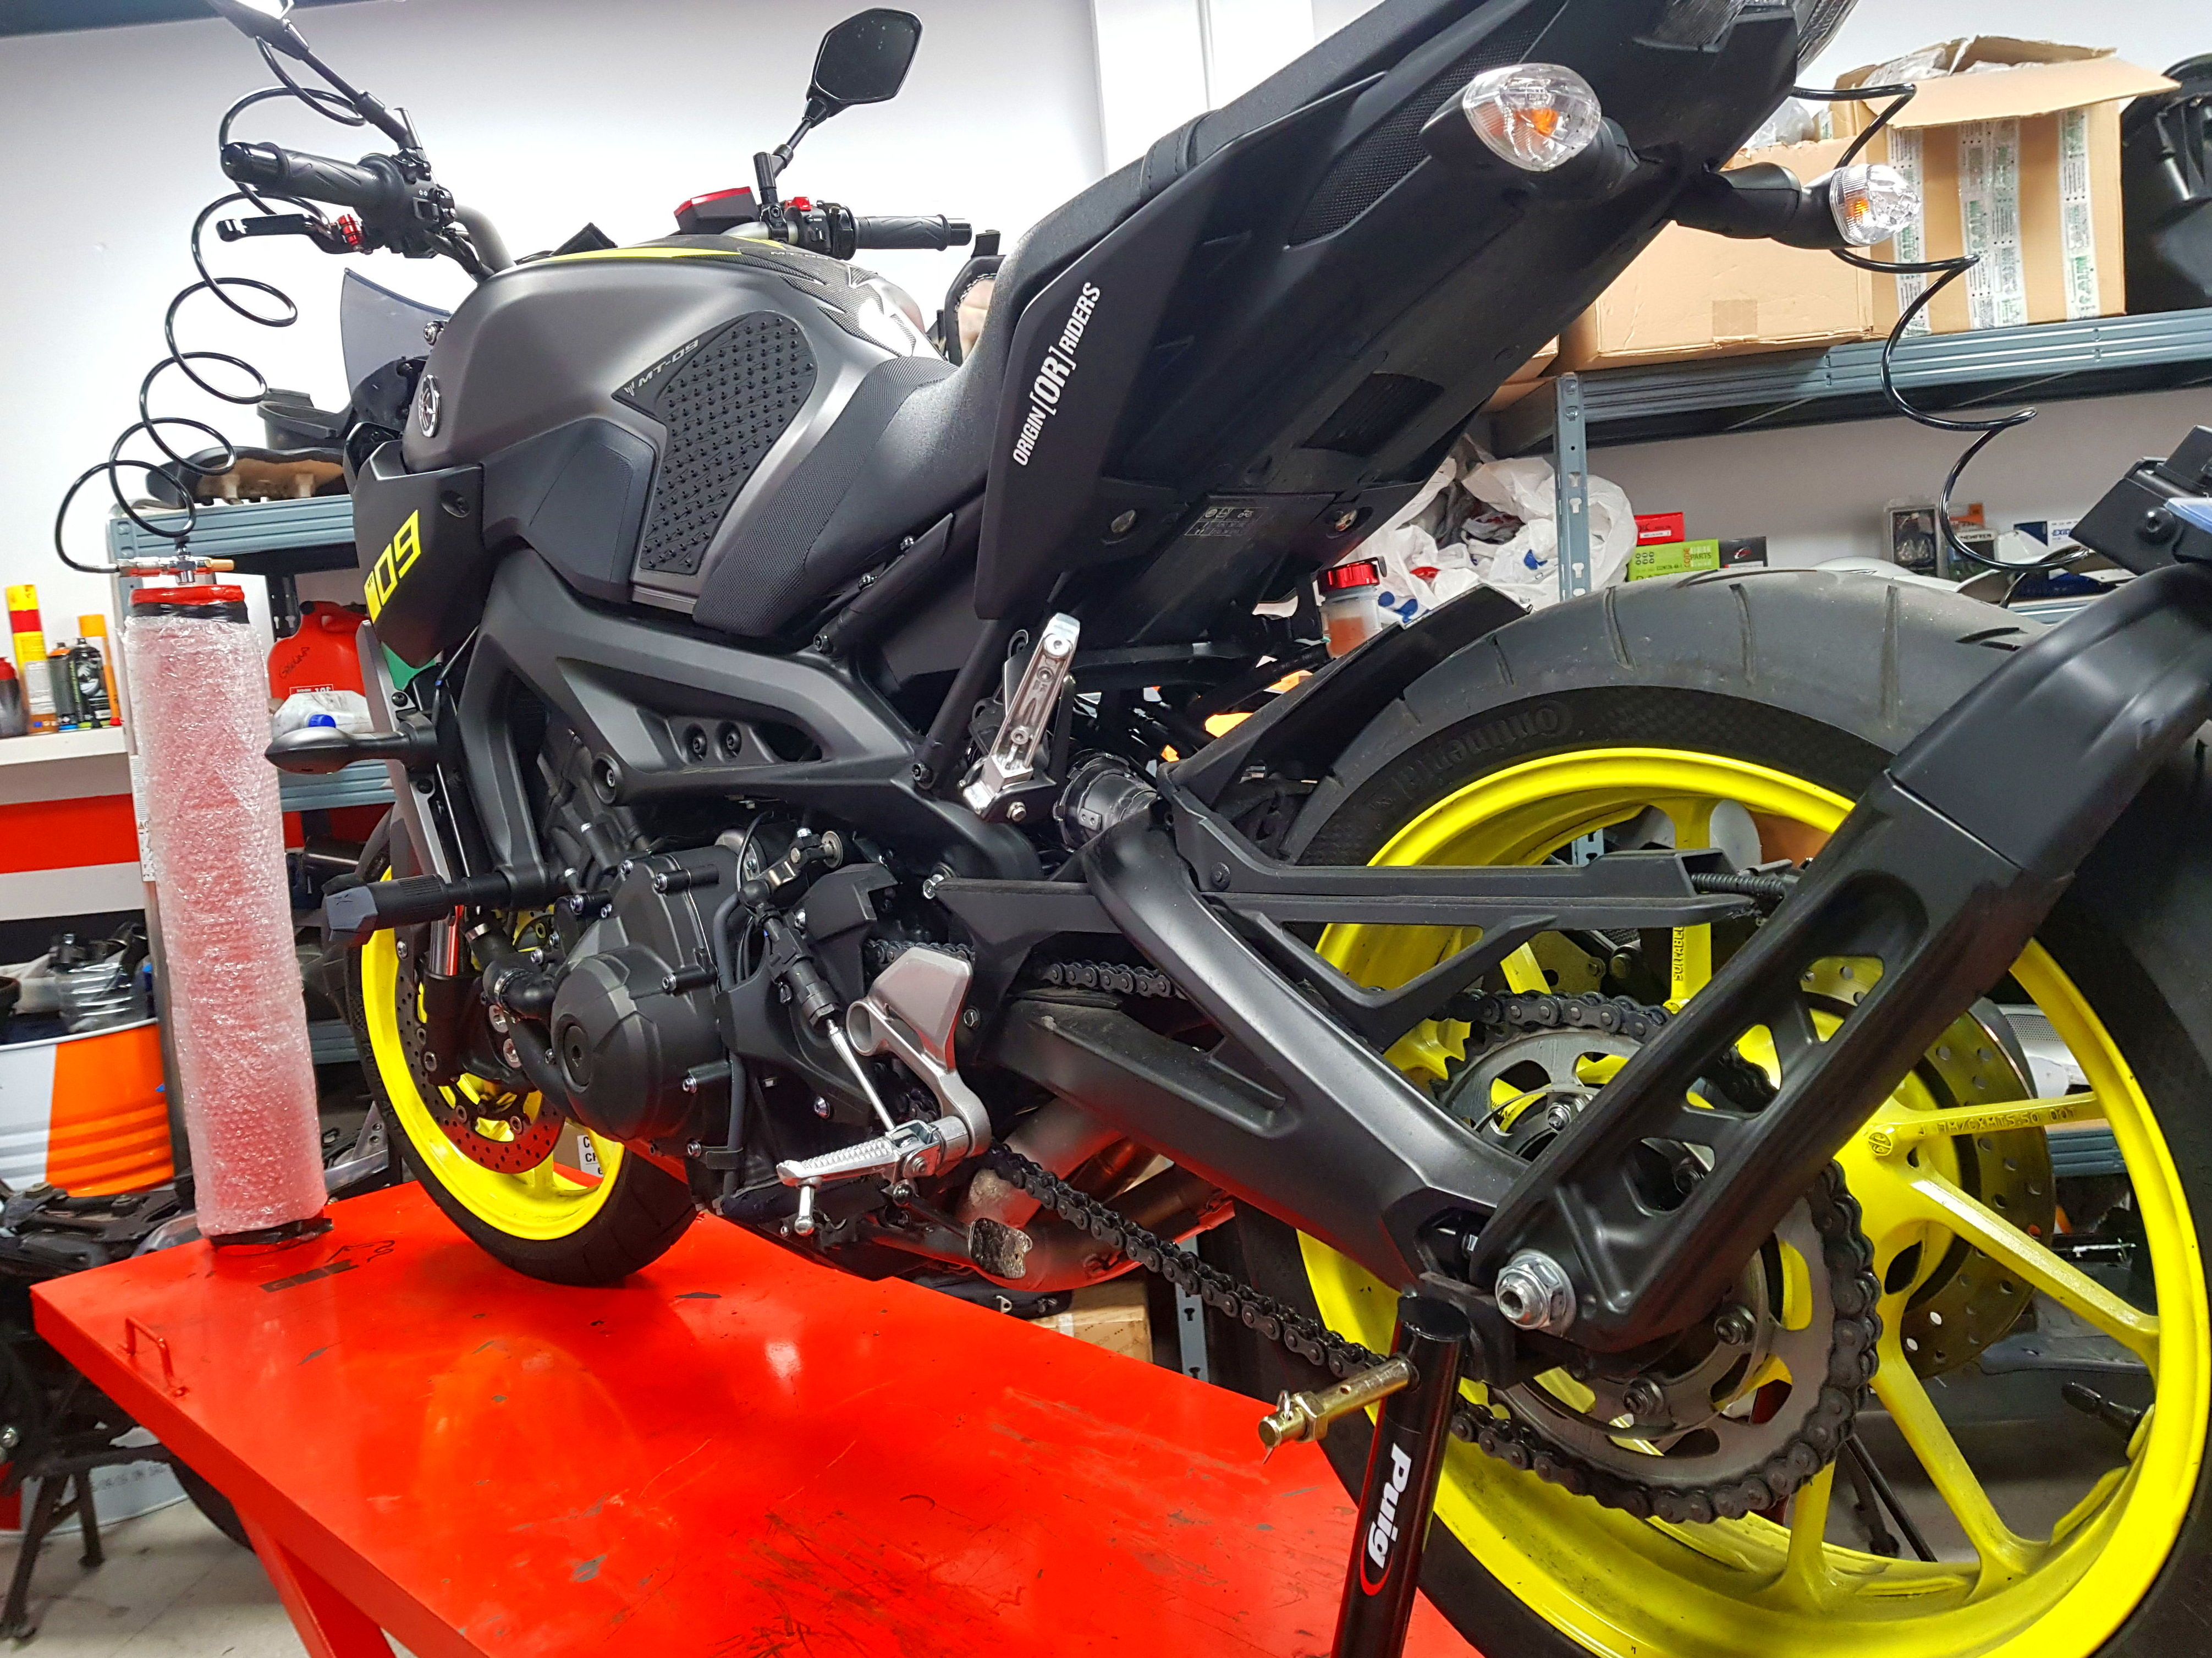 Foto 4 de Taller de motos multimarca en Mataró | Motos Iluro